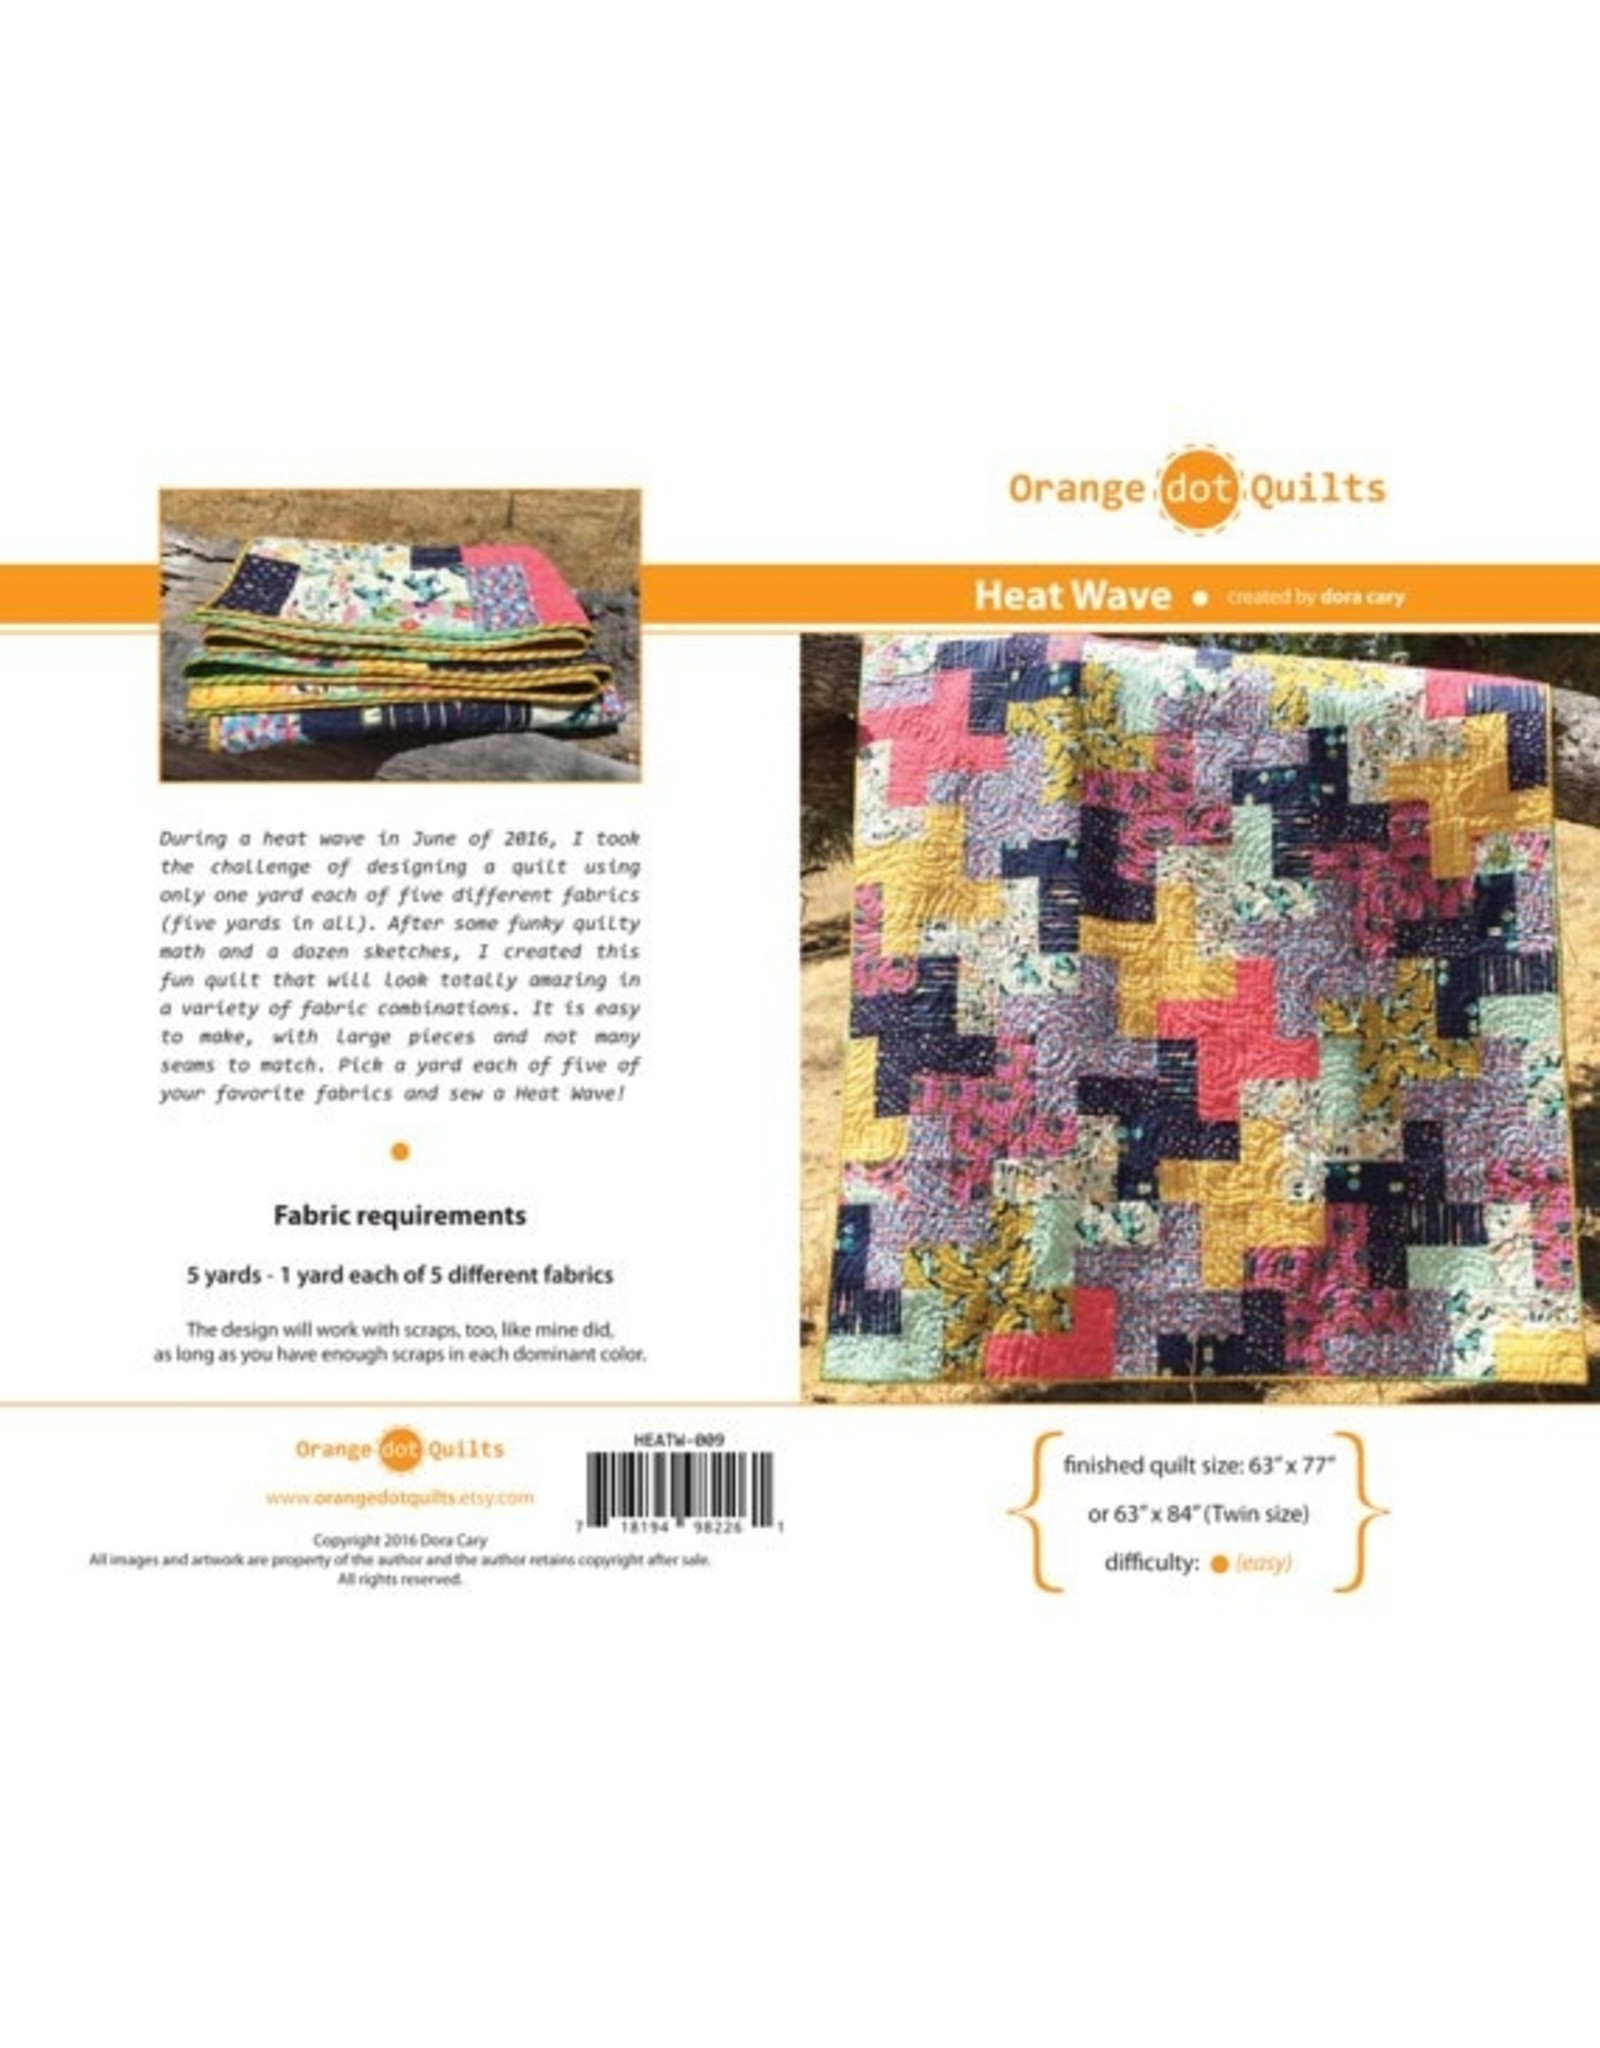 Orange Dot Quilts Heat Wave Quilt Pattern